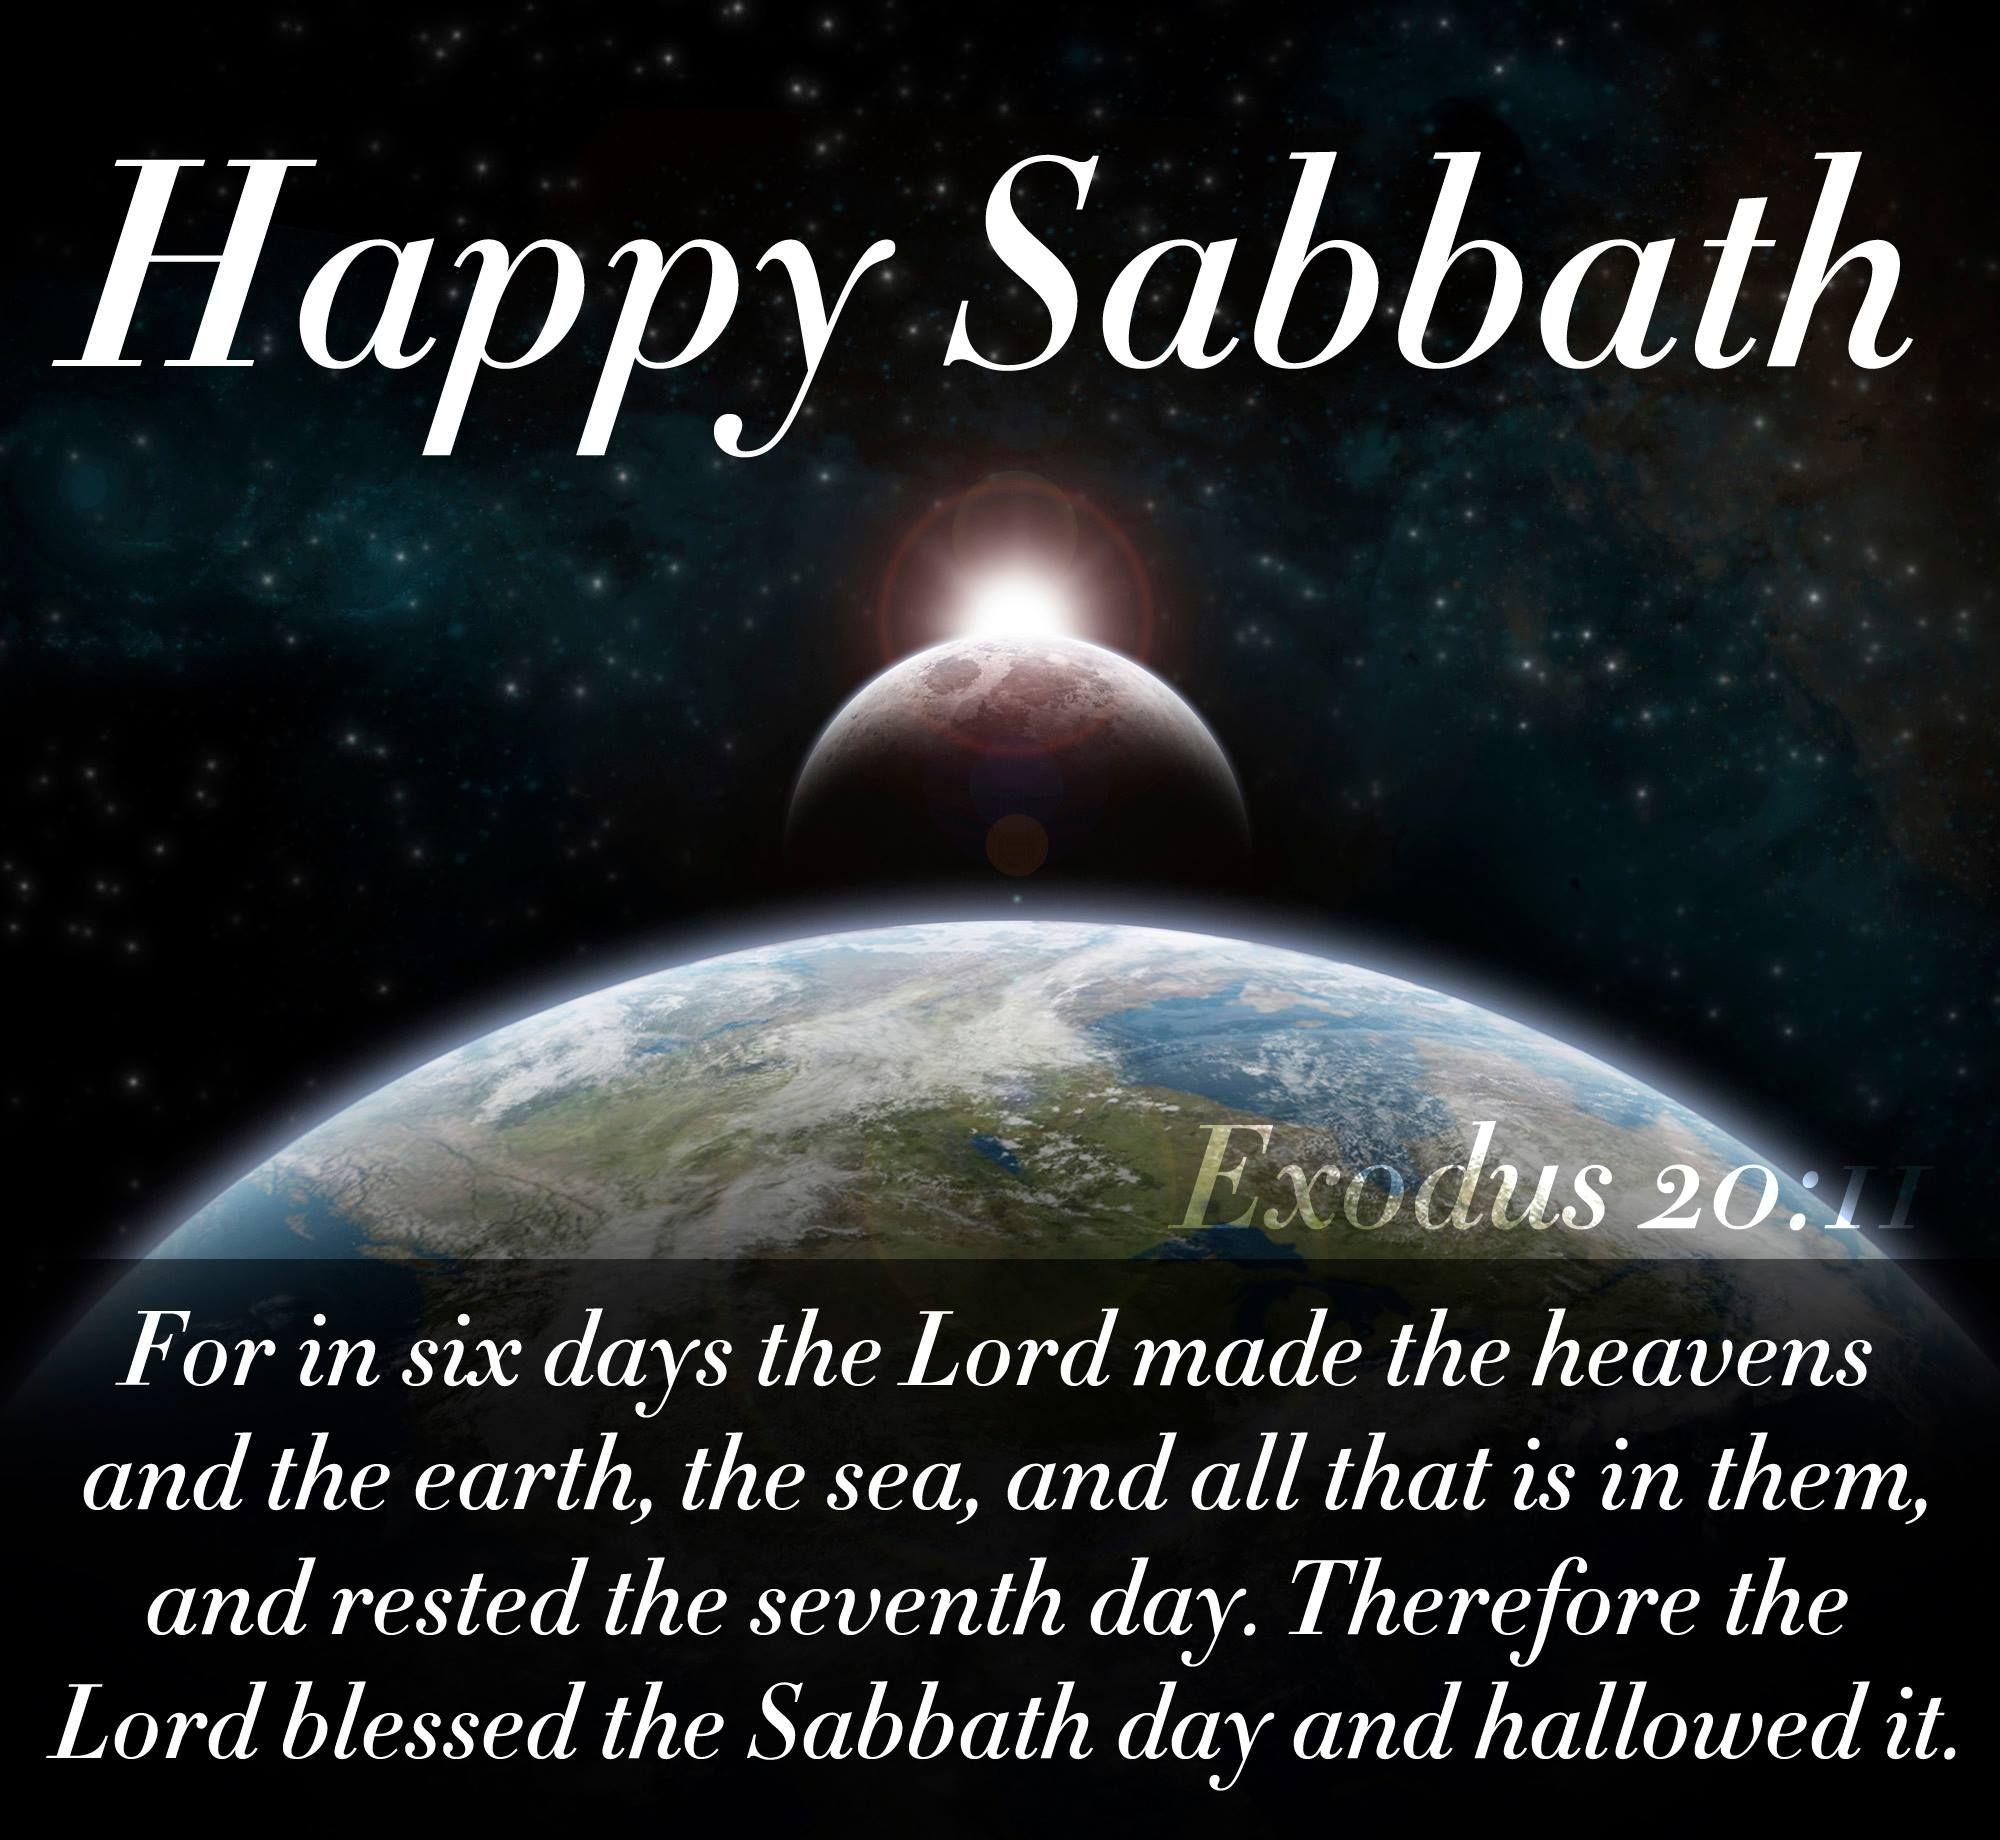 Happy sabbath quotes quotesgram for 20 images